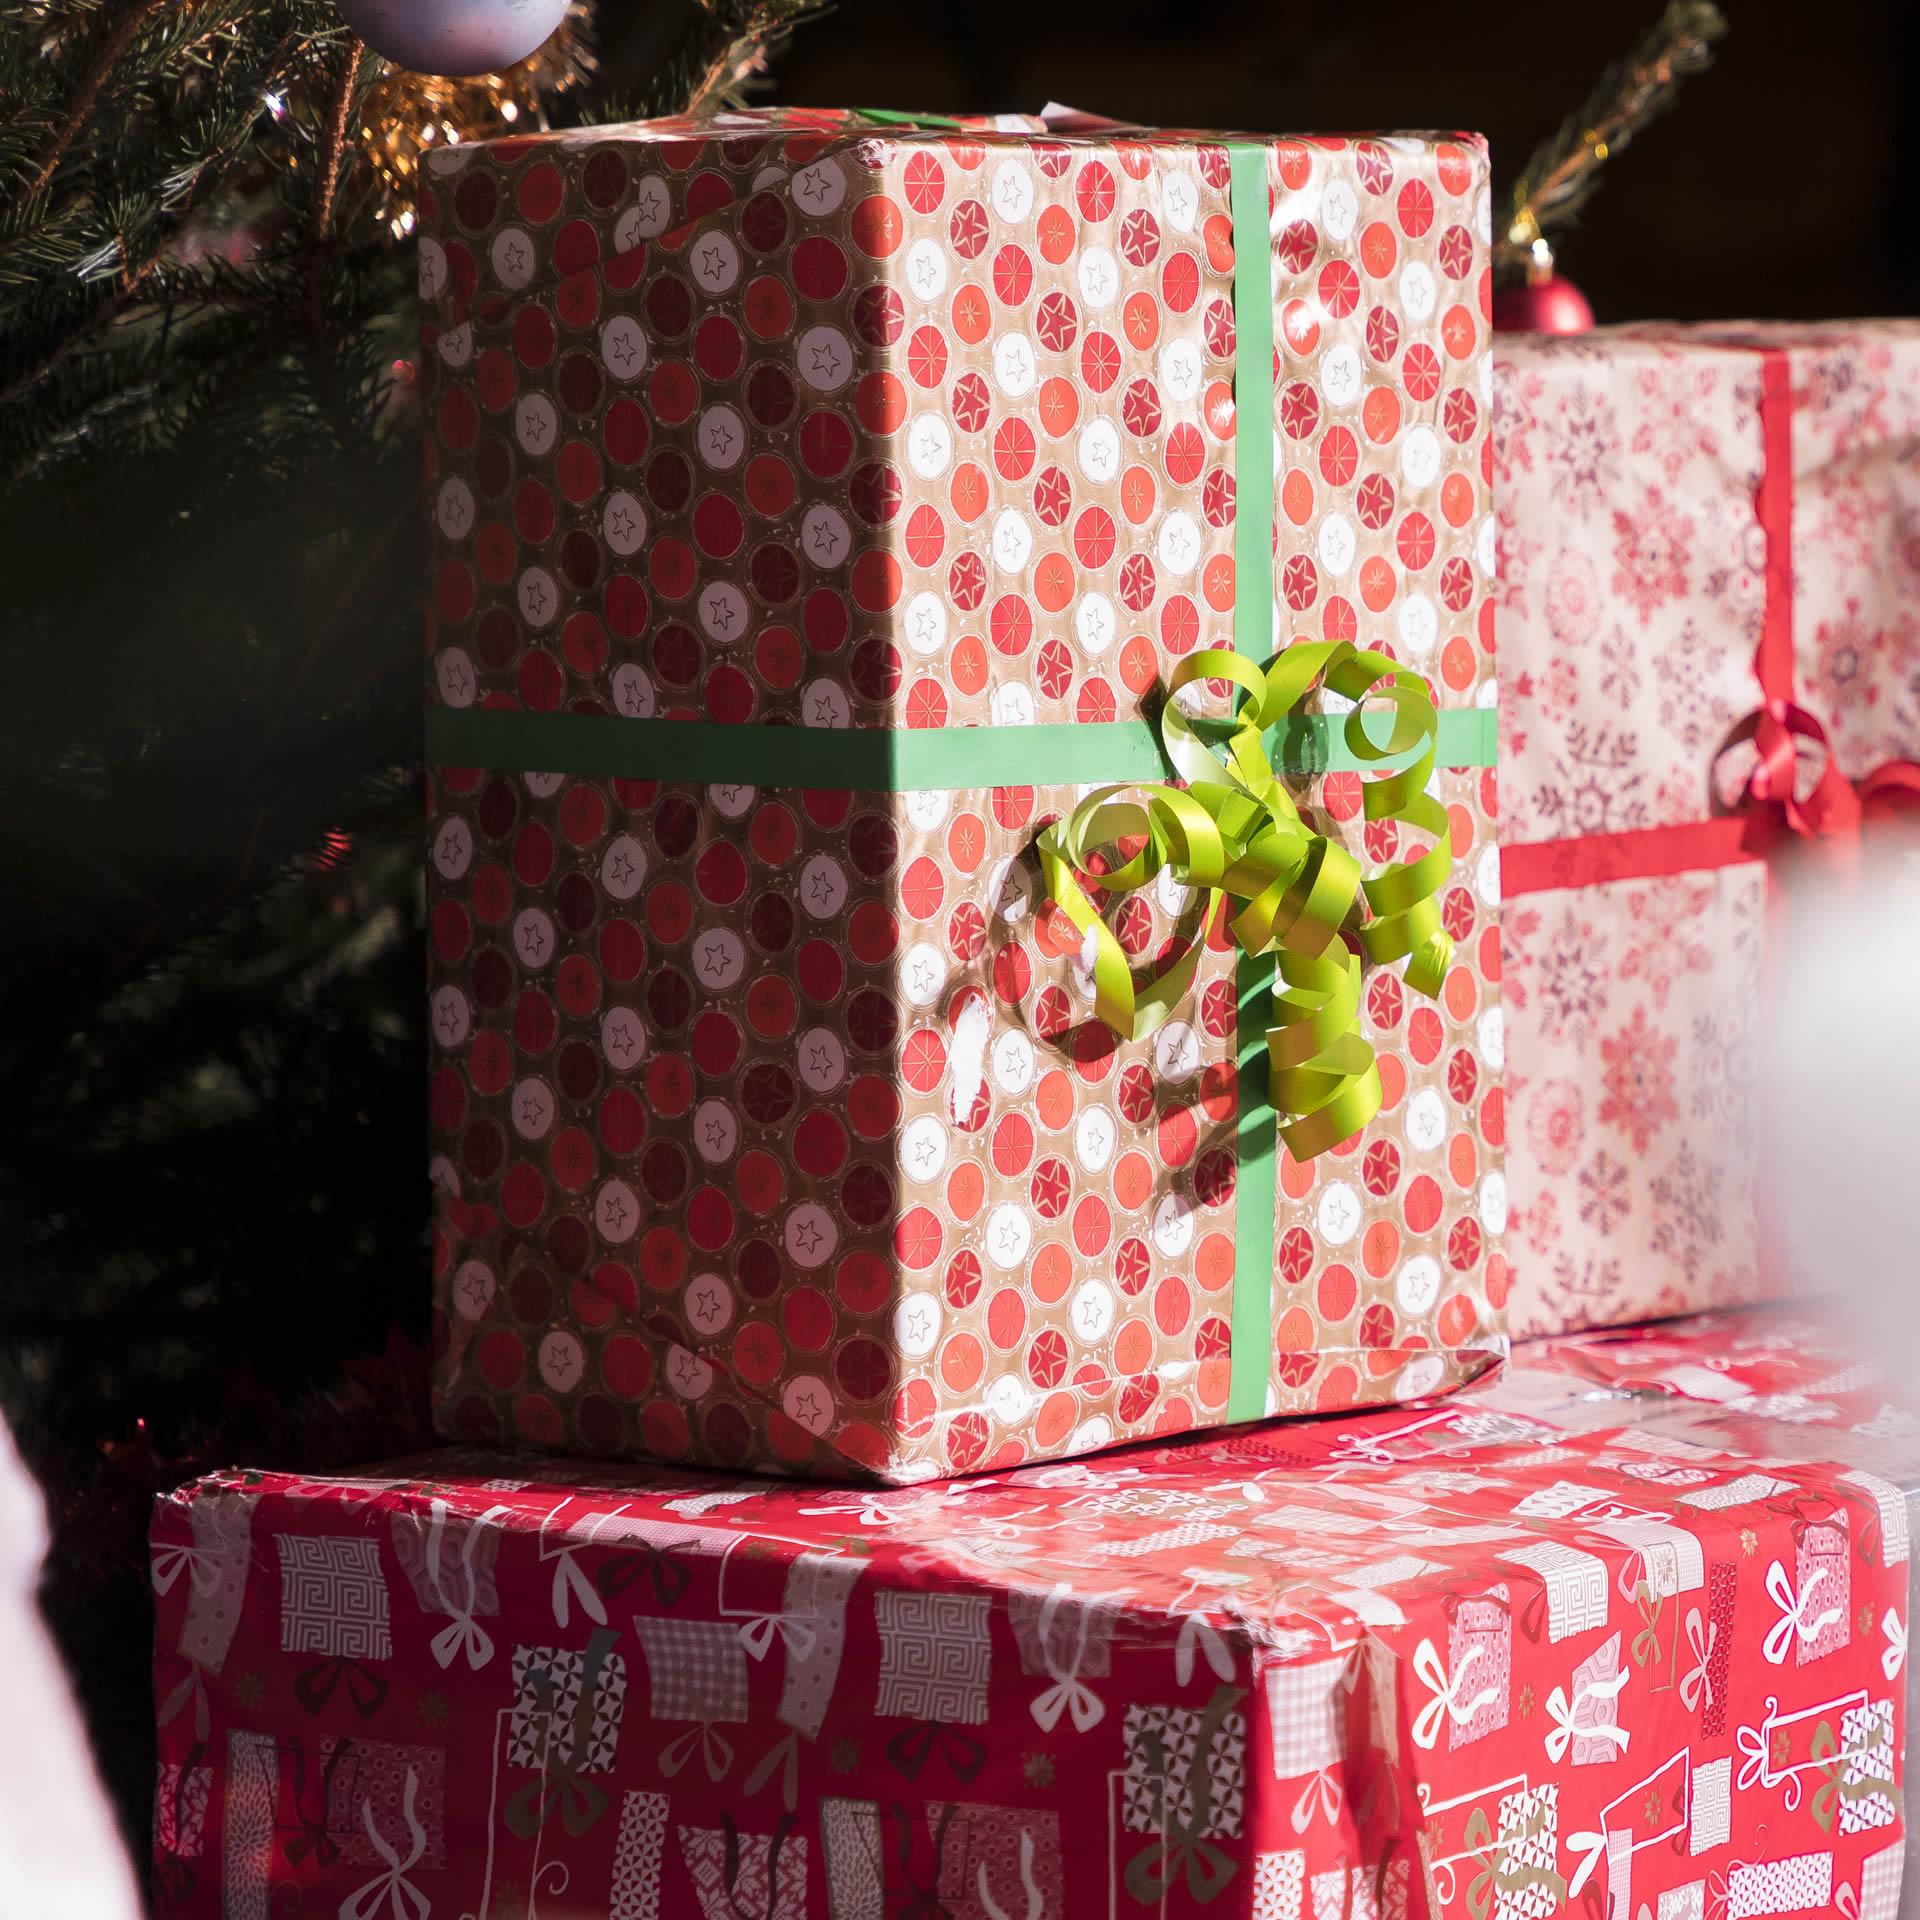 Geschenke - Souvenirs